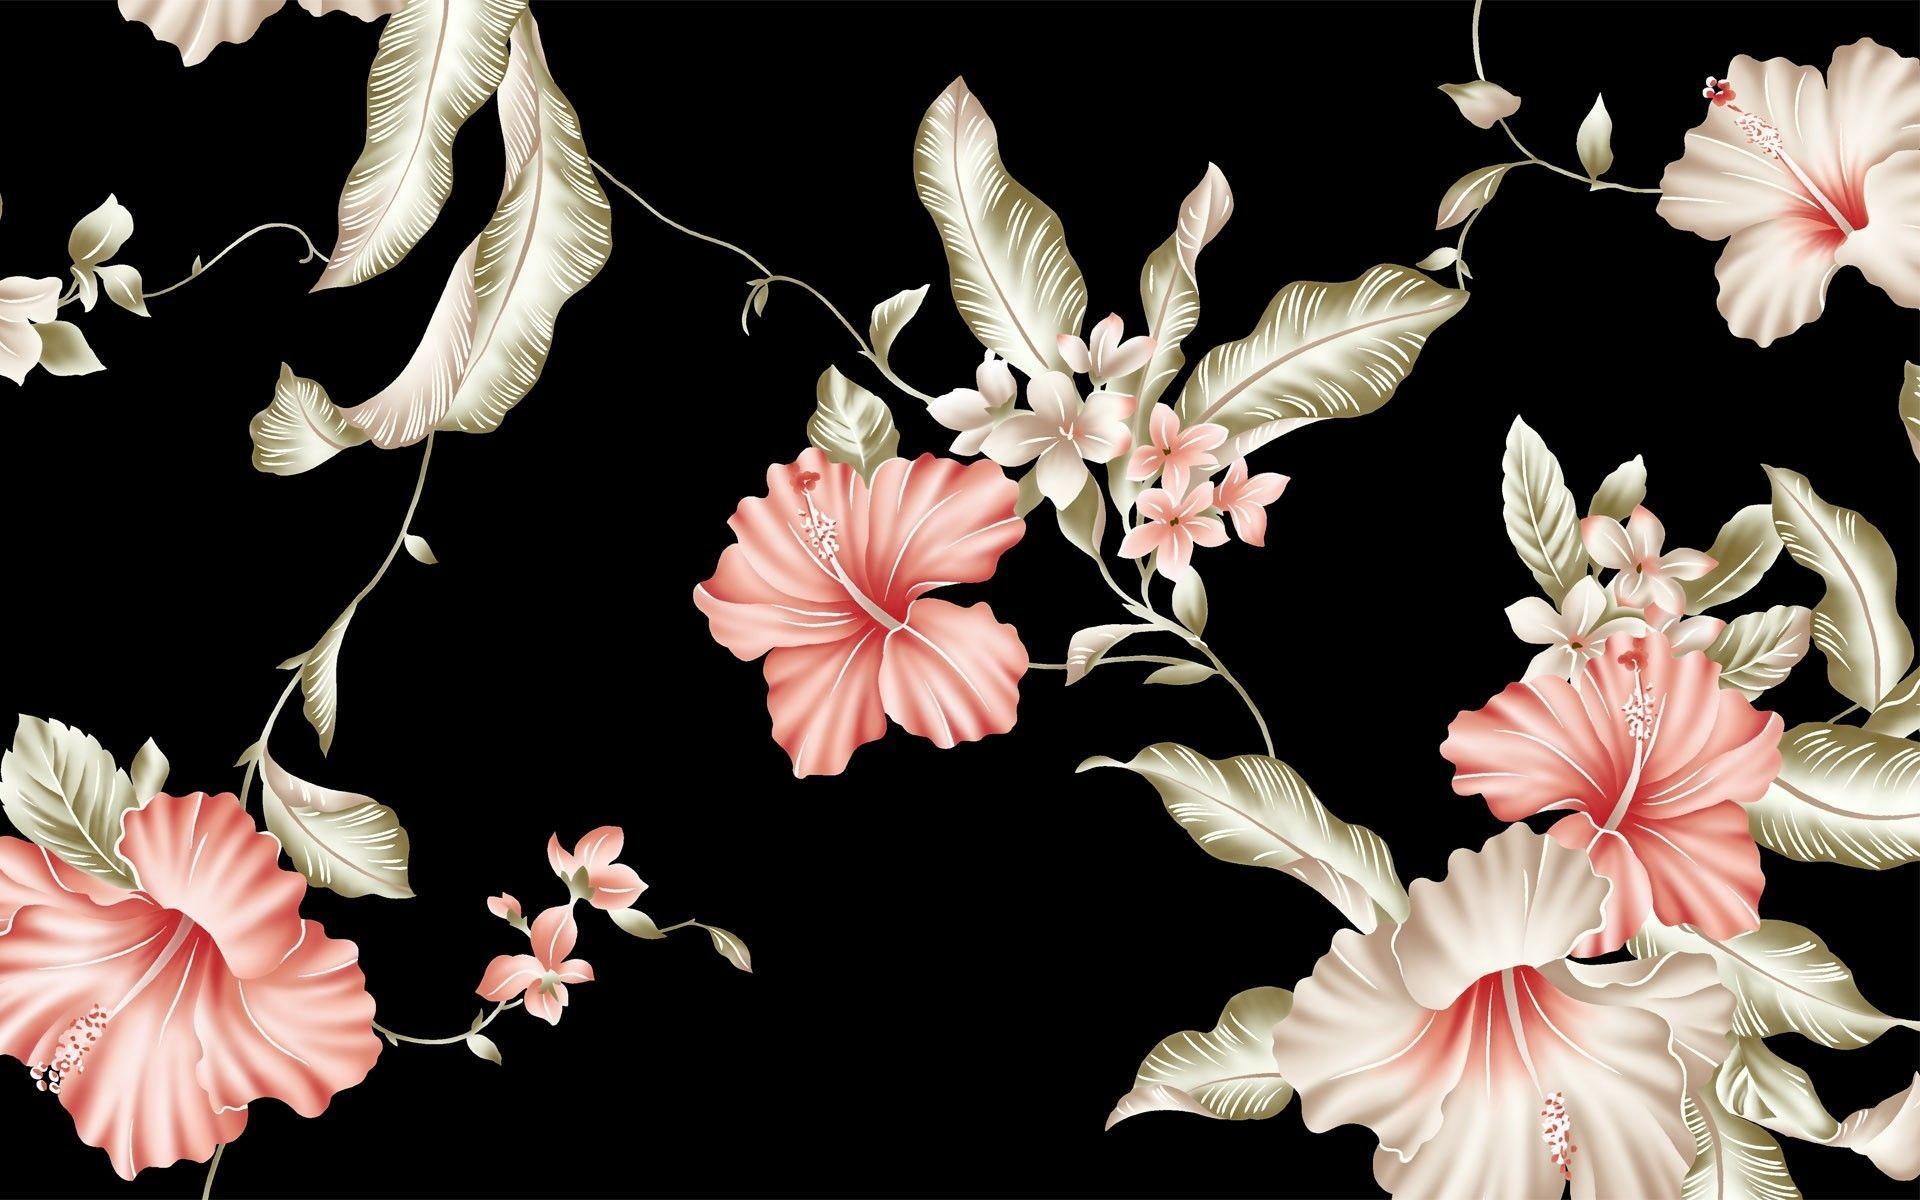 Wallpapers Rose Flower 1024×768 Flowery Wallpapers (36 Wallpapers) |  Adorable Wallpapers | Desktop | Pinterest | Flowery wallpaper and Wallpaper